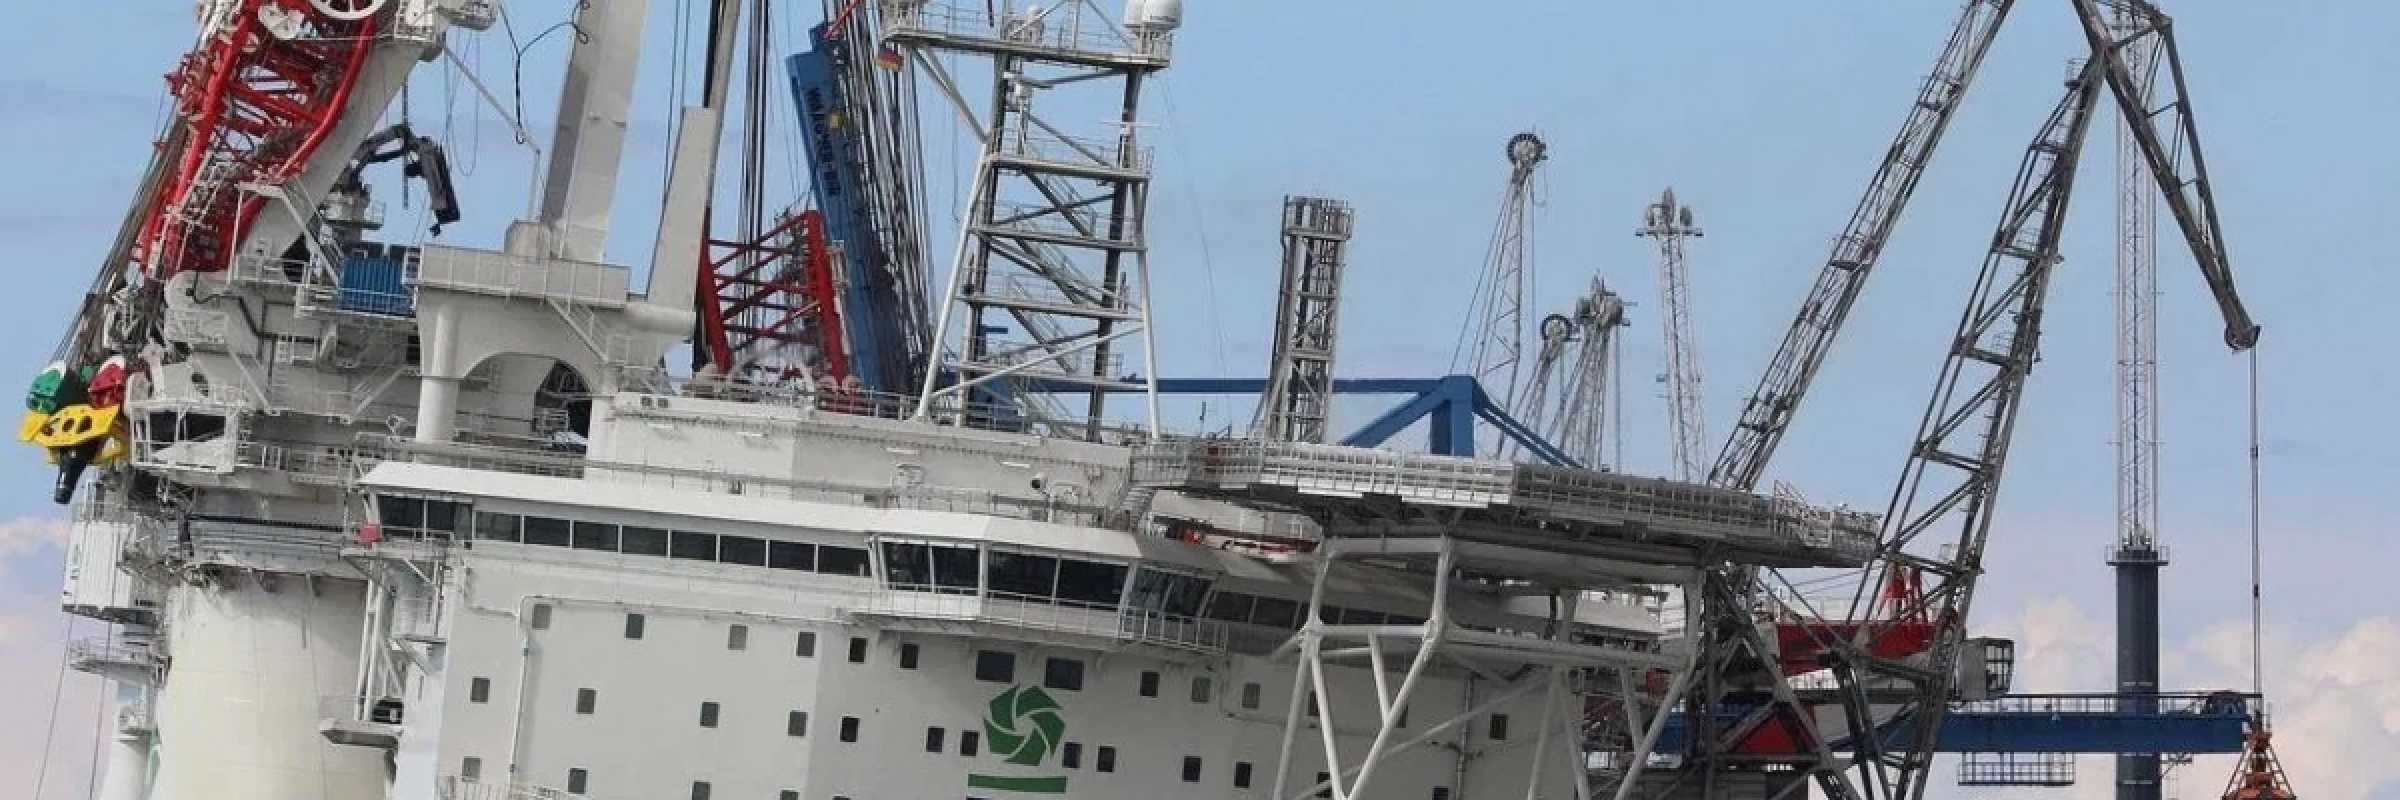 Orion 1 crane collapse leaves ten injured